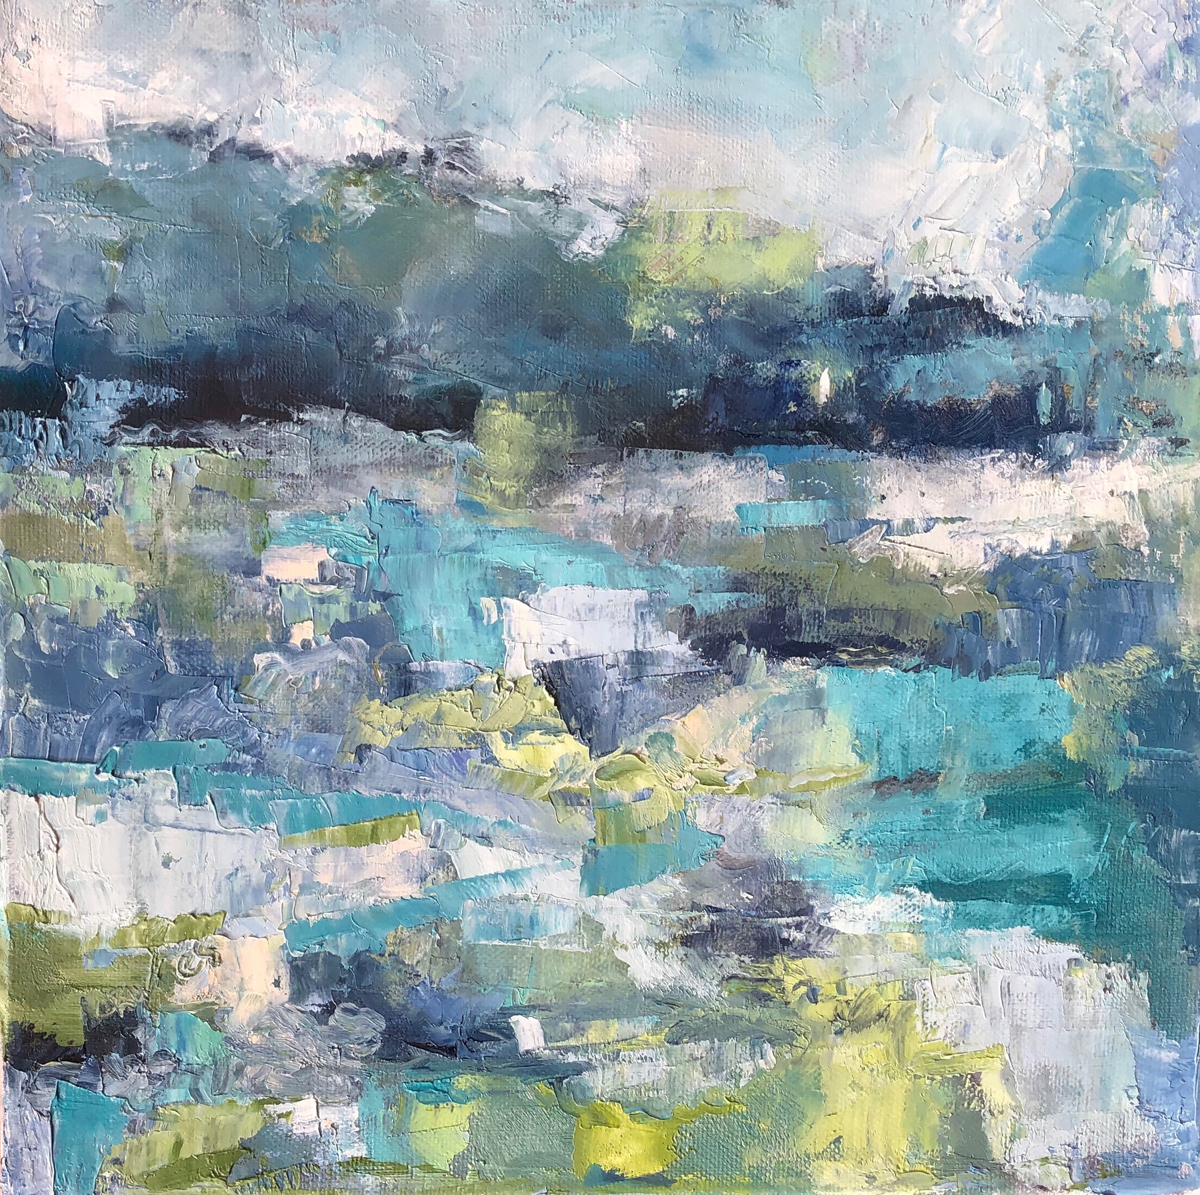 Windy Seas (large view)